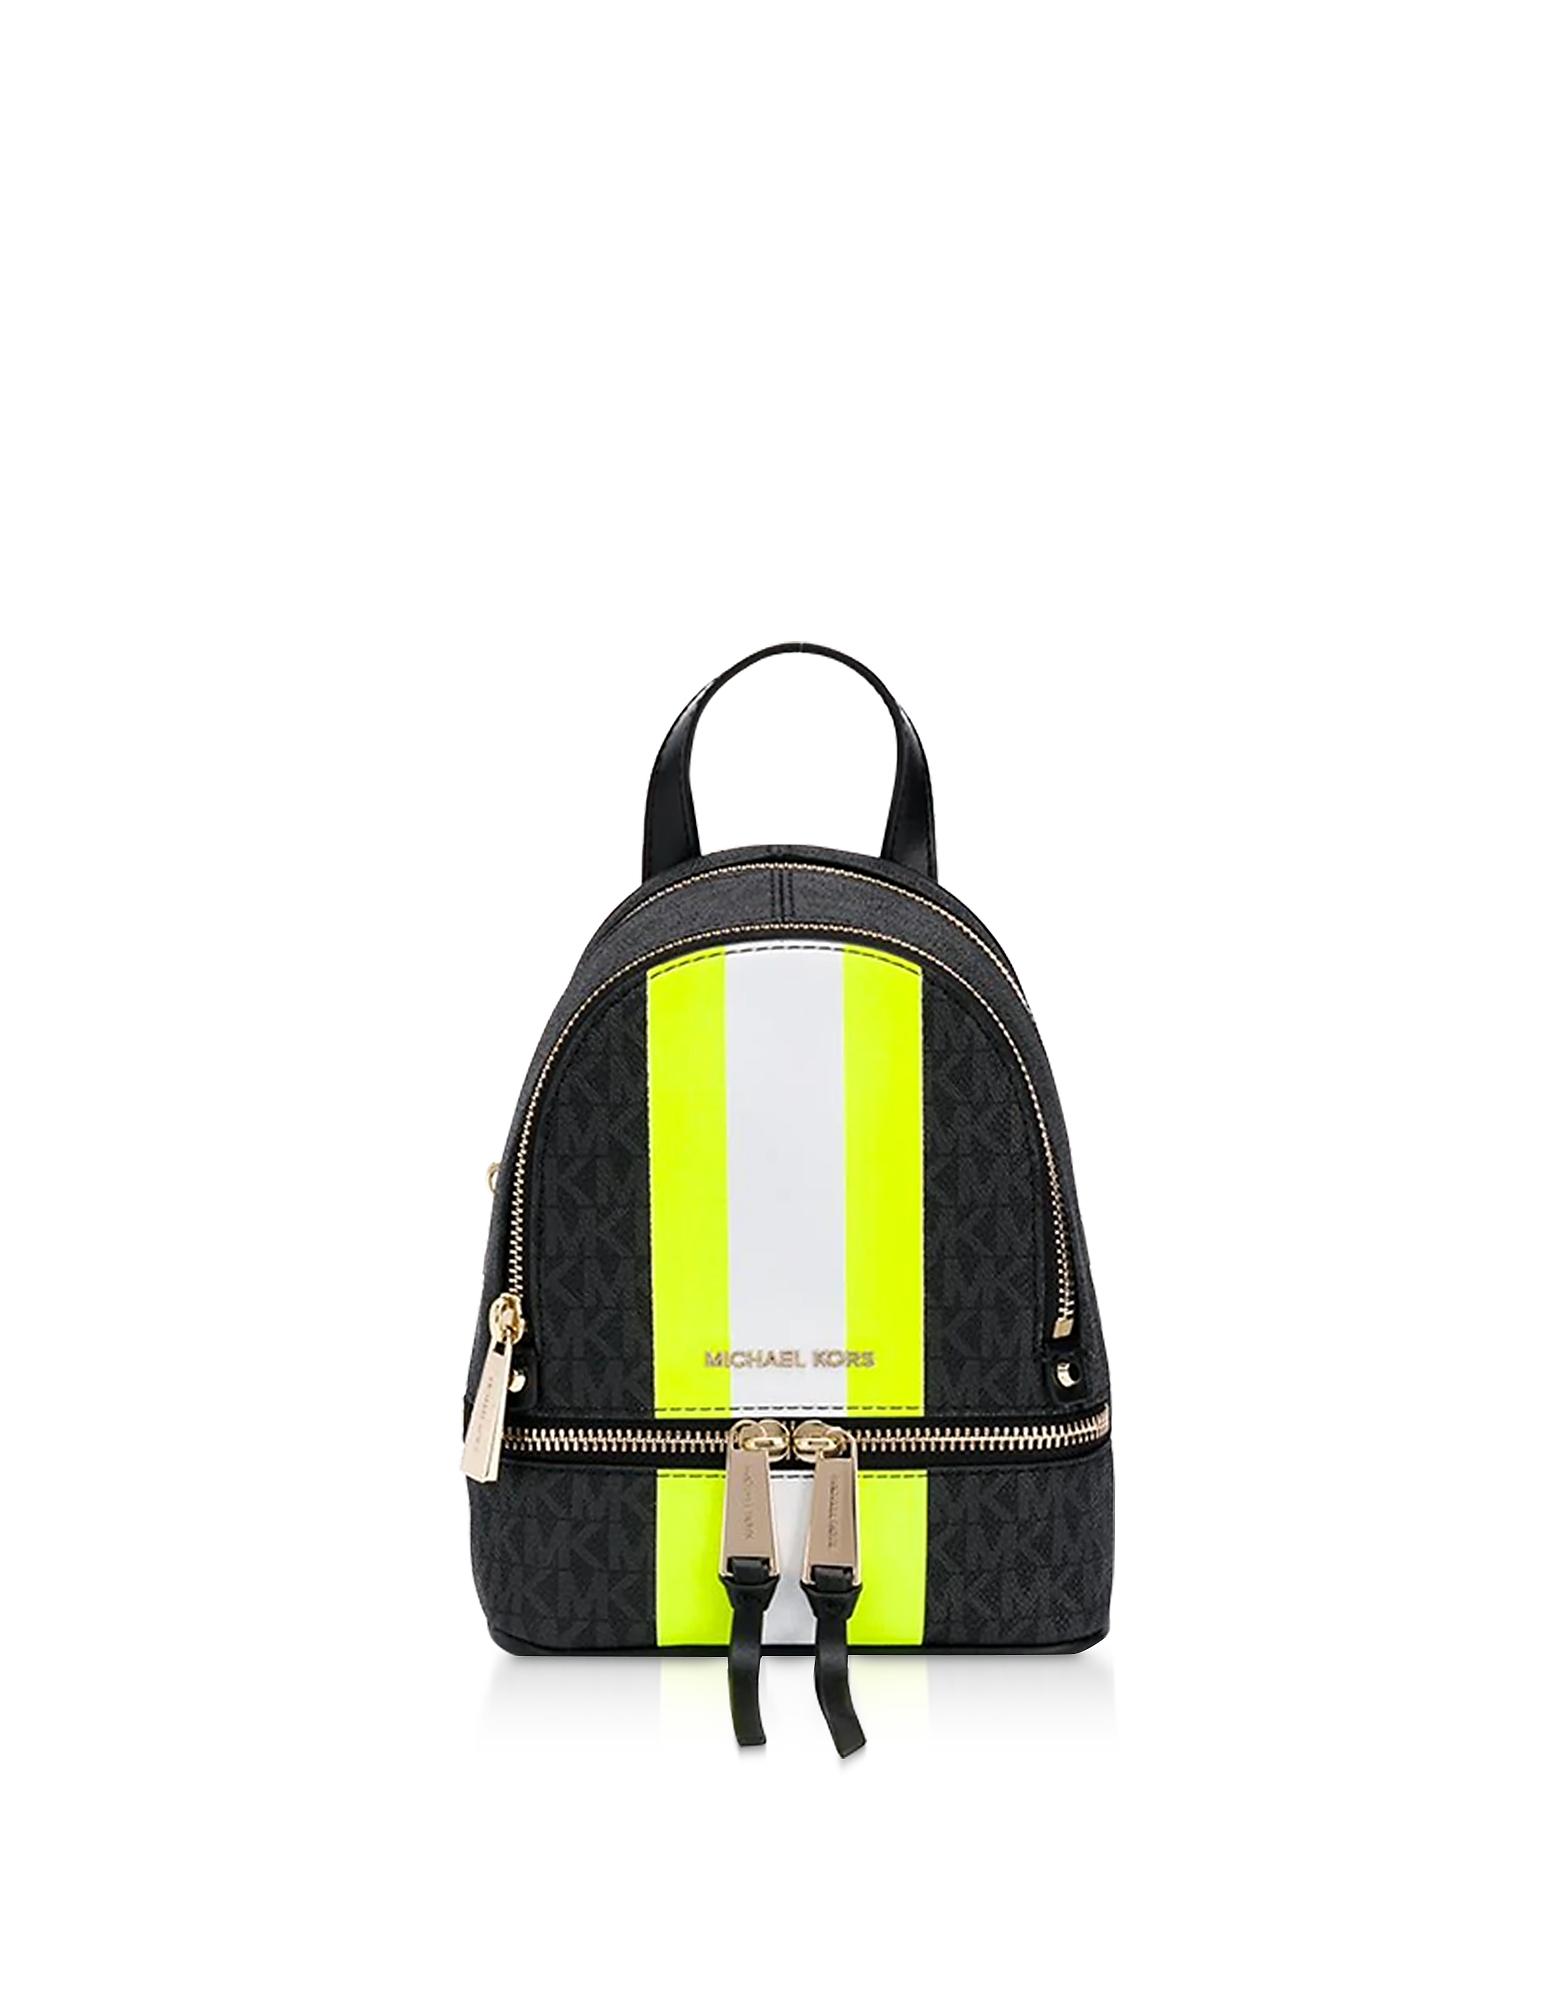 Michael Kors  Handbags Rhea Backpack w/ Neon Stripe